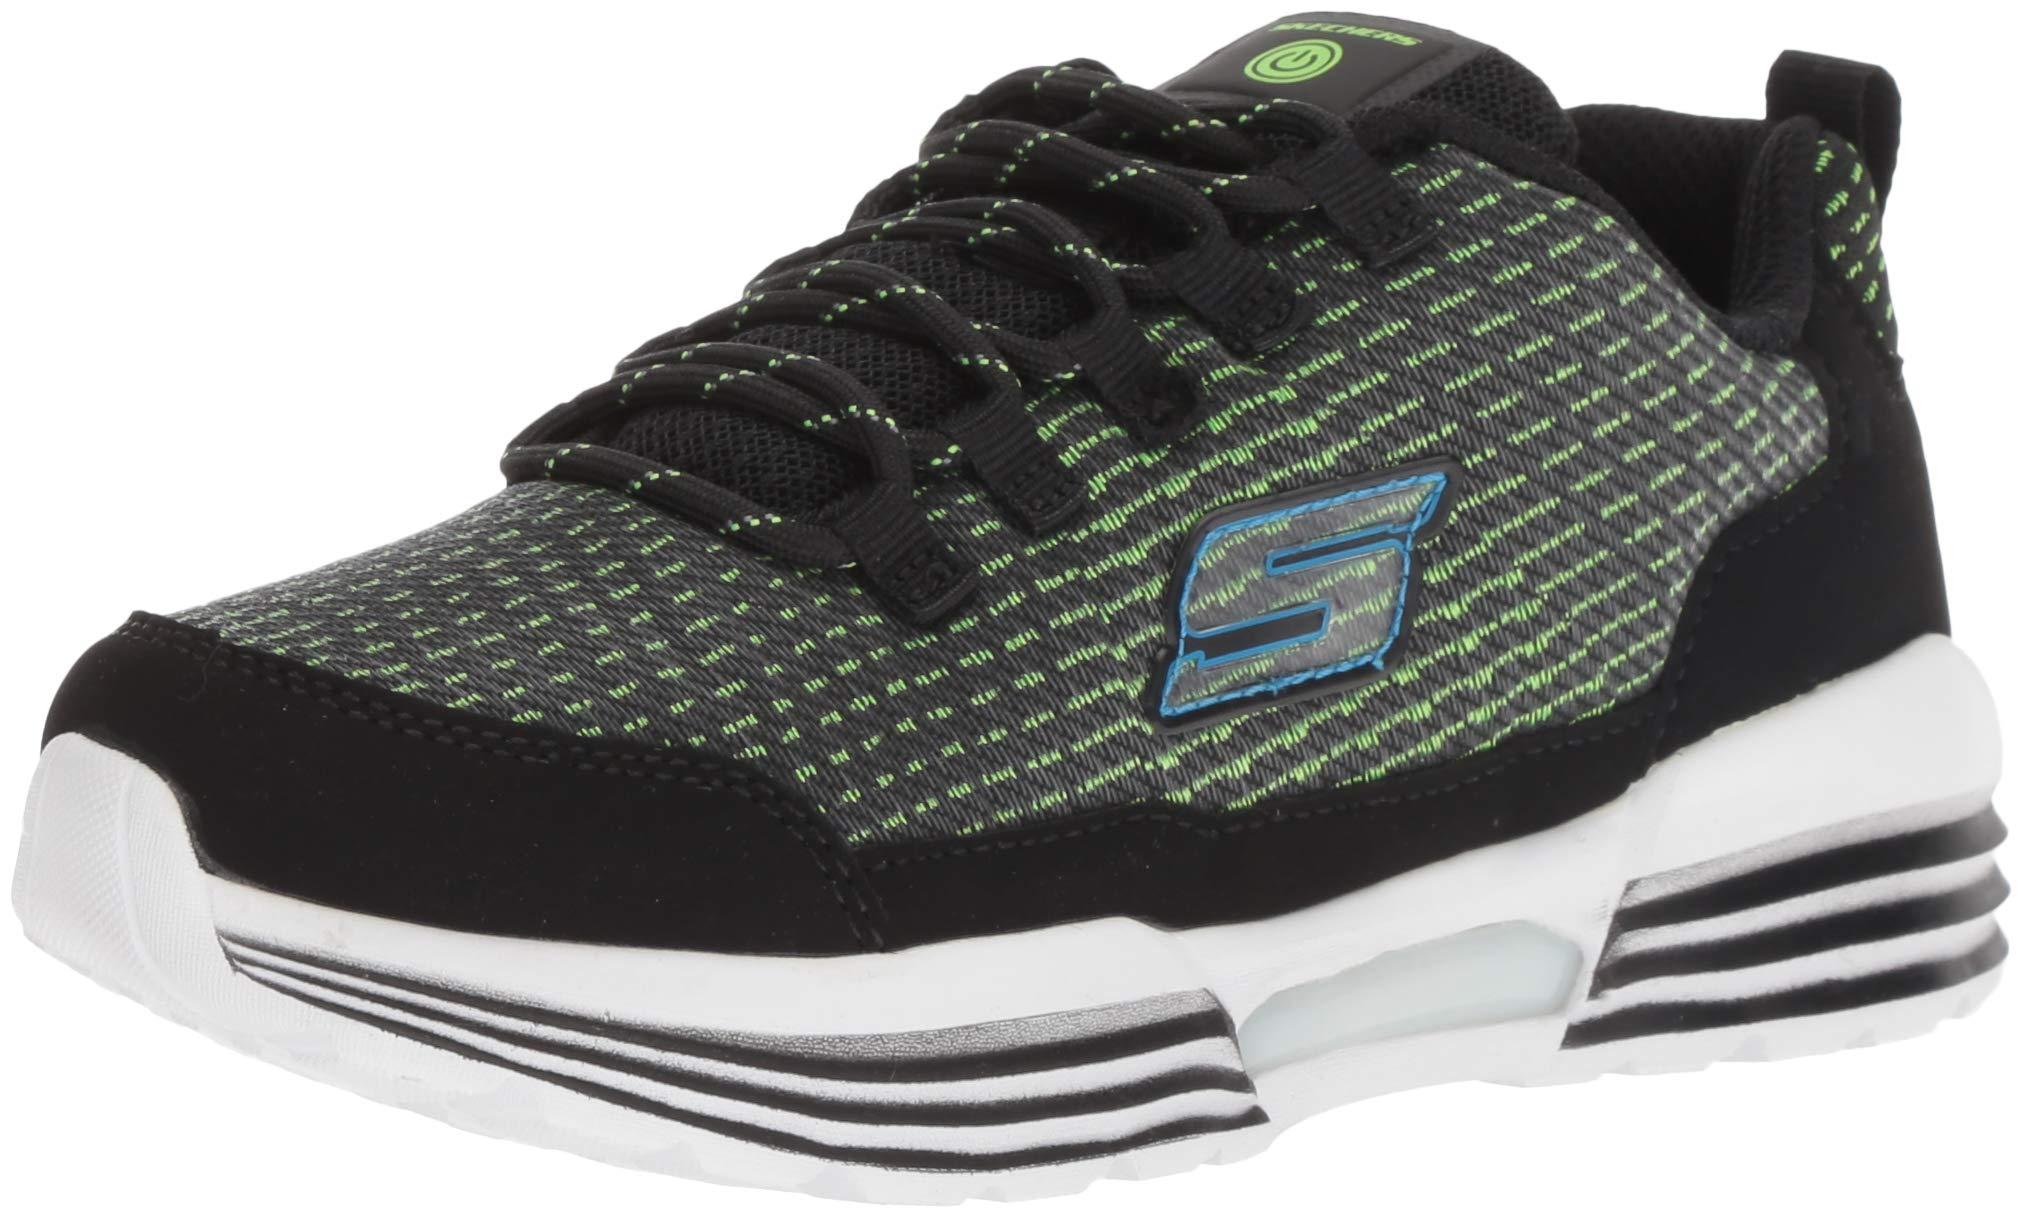 Skechers Kids Boys' S Lights-Luminators Sneaker, Black/Lime, 2 Medium US Little Kid